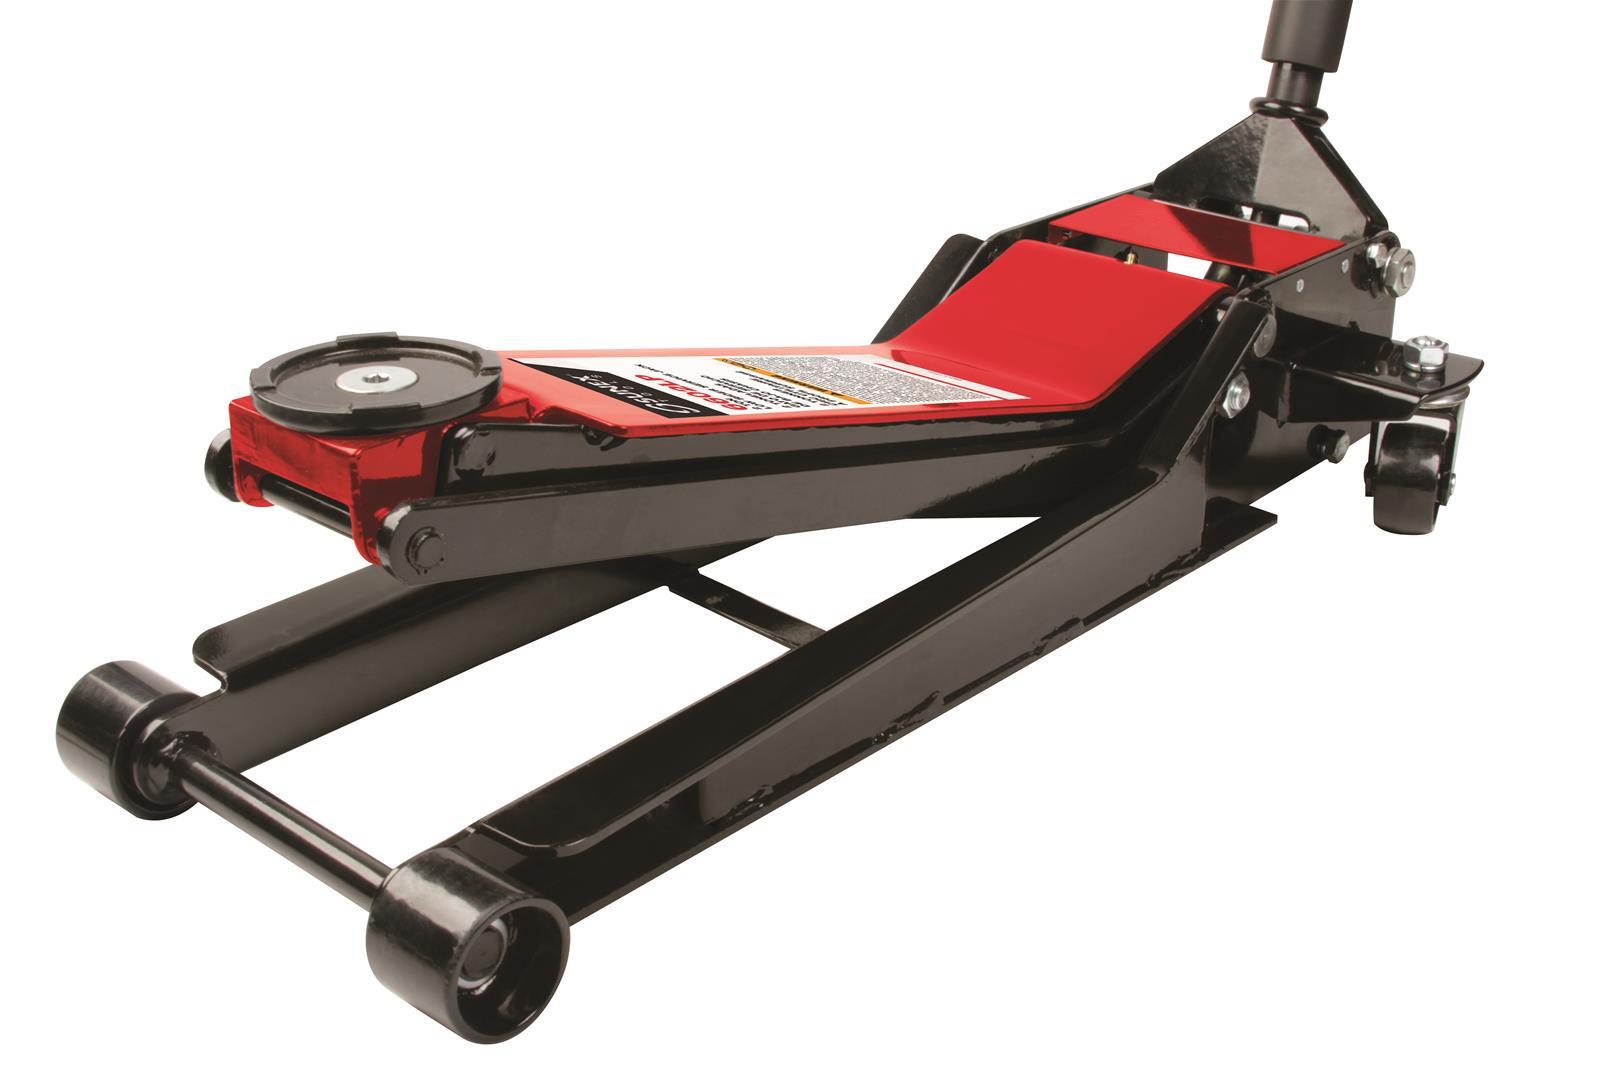 sunex tools 2 ton lowrider service jacks 6602lp - free shipping on